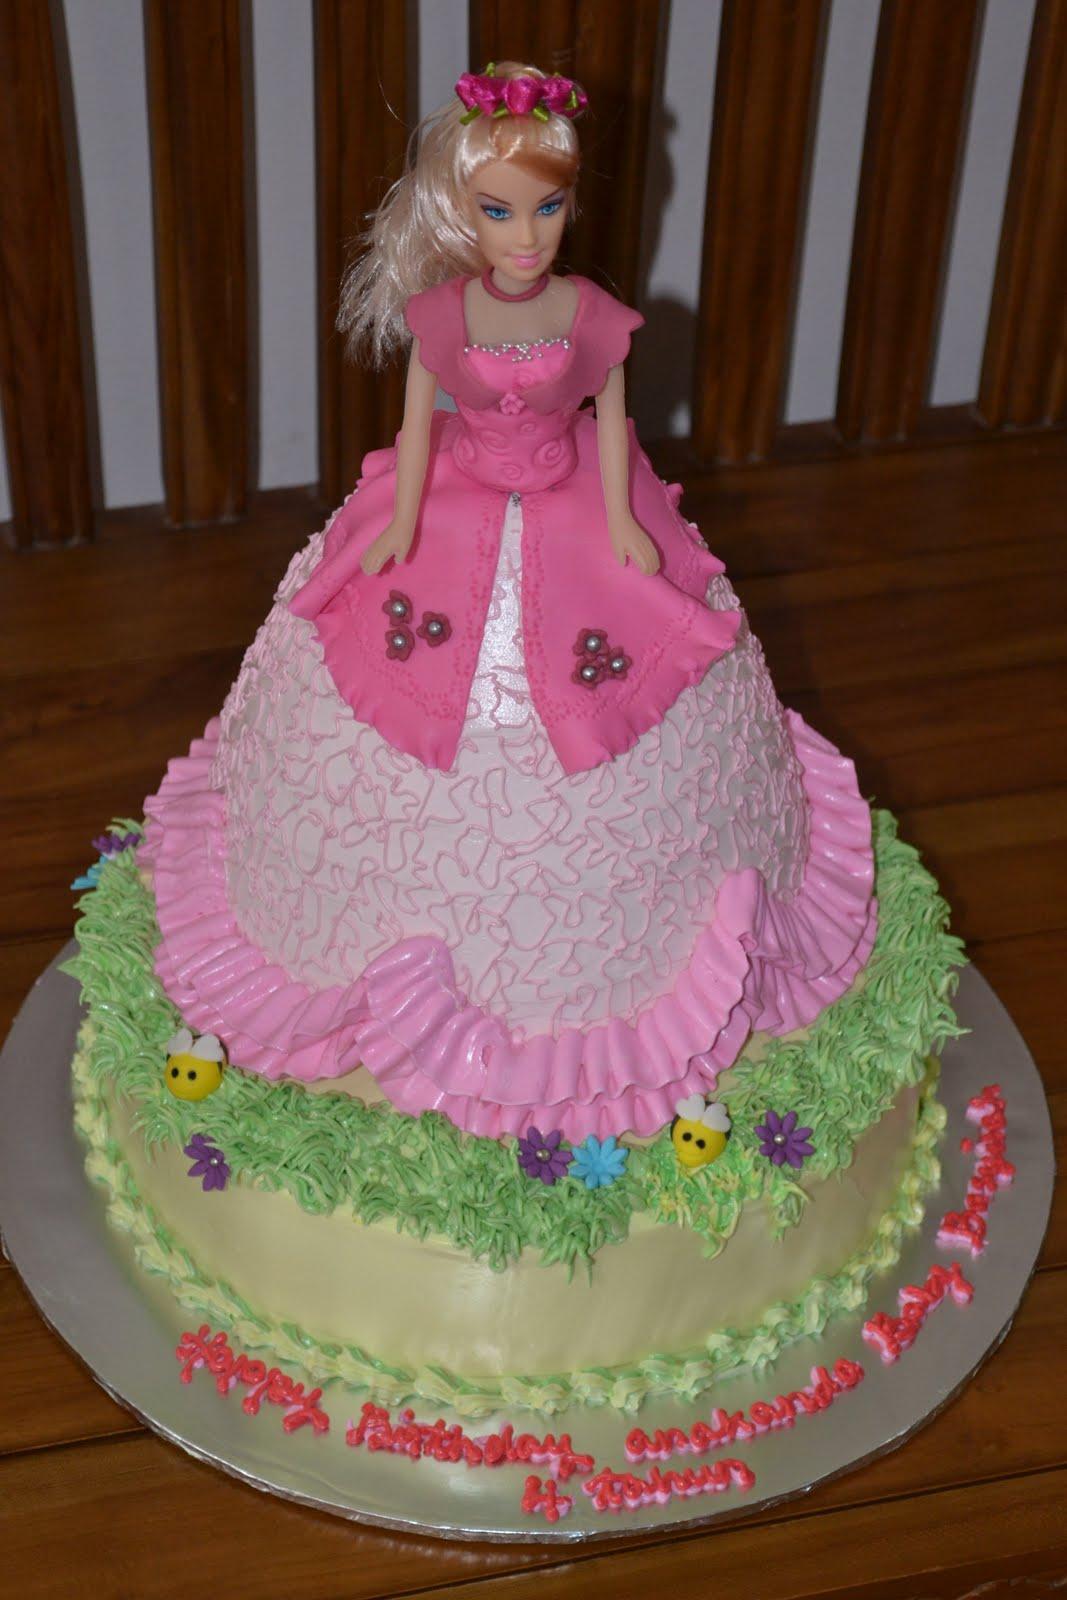 Mypu3 cake house